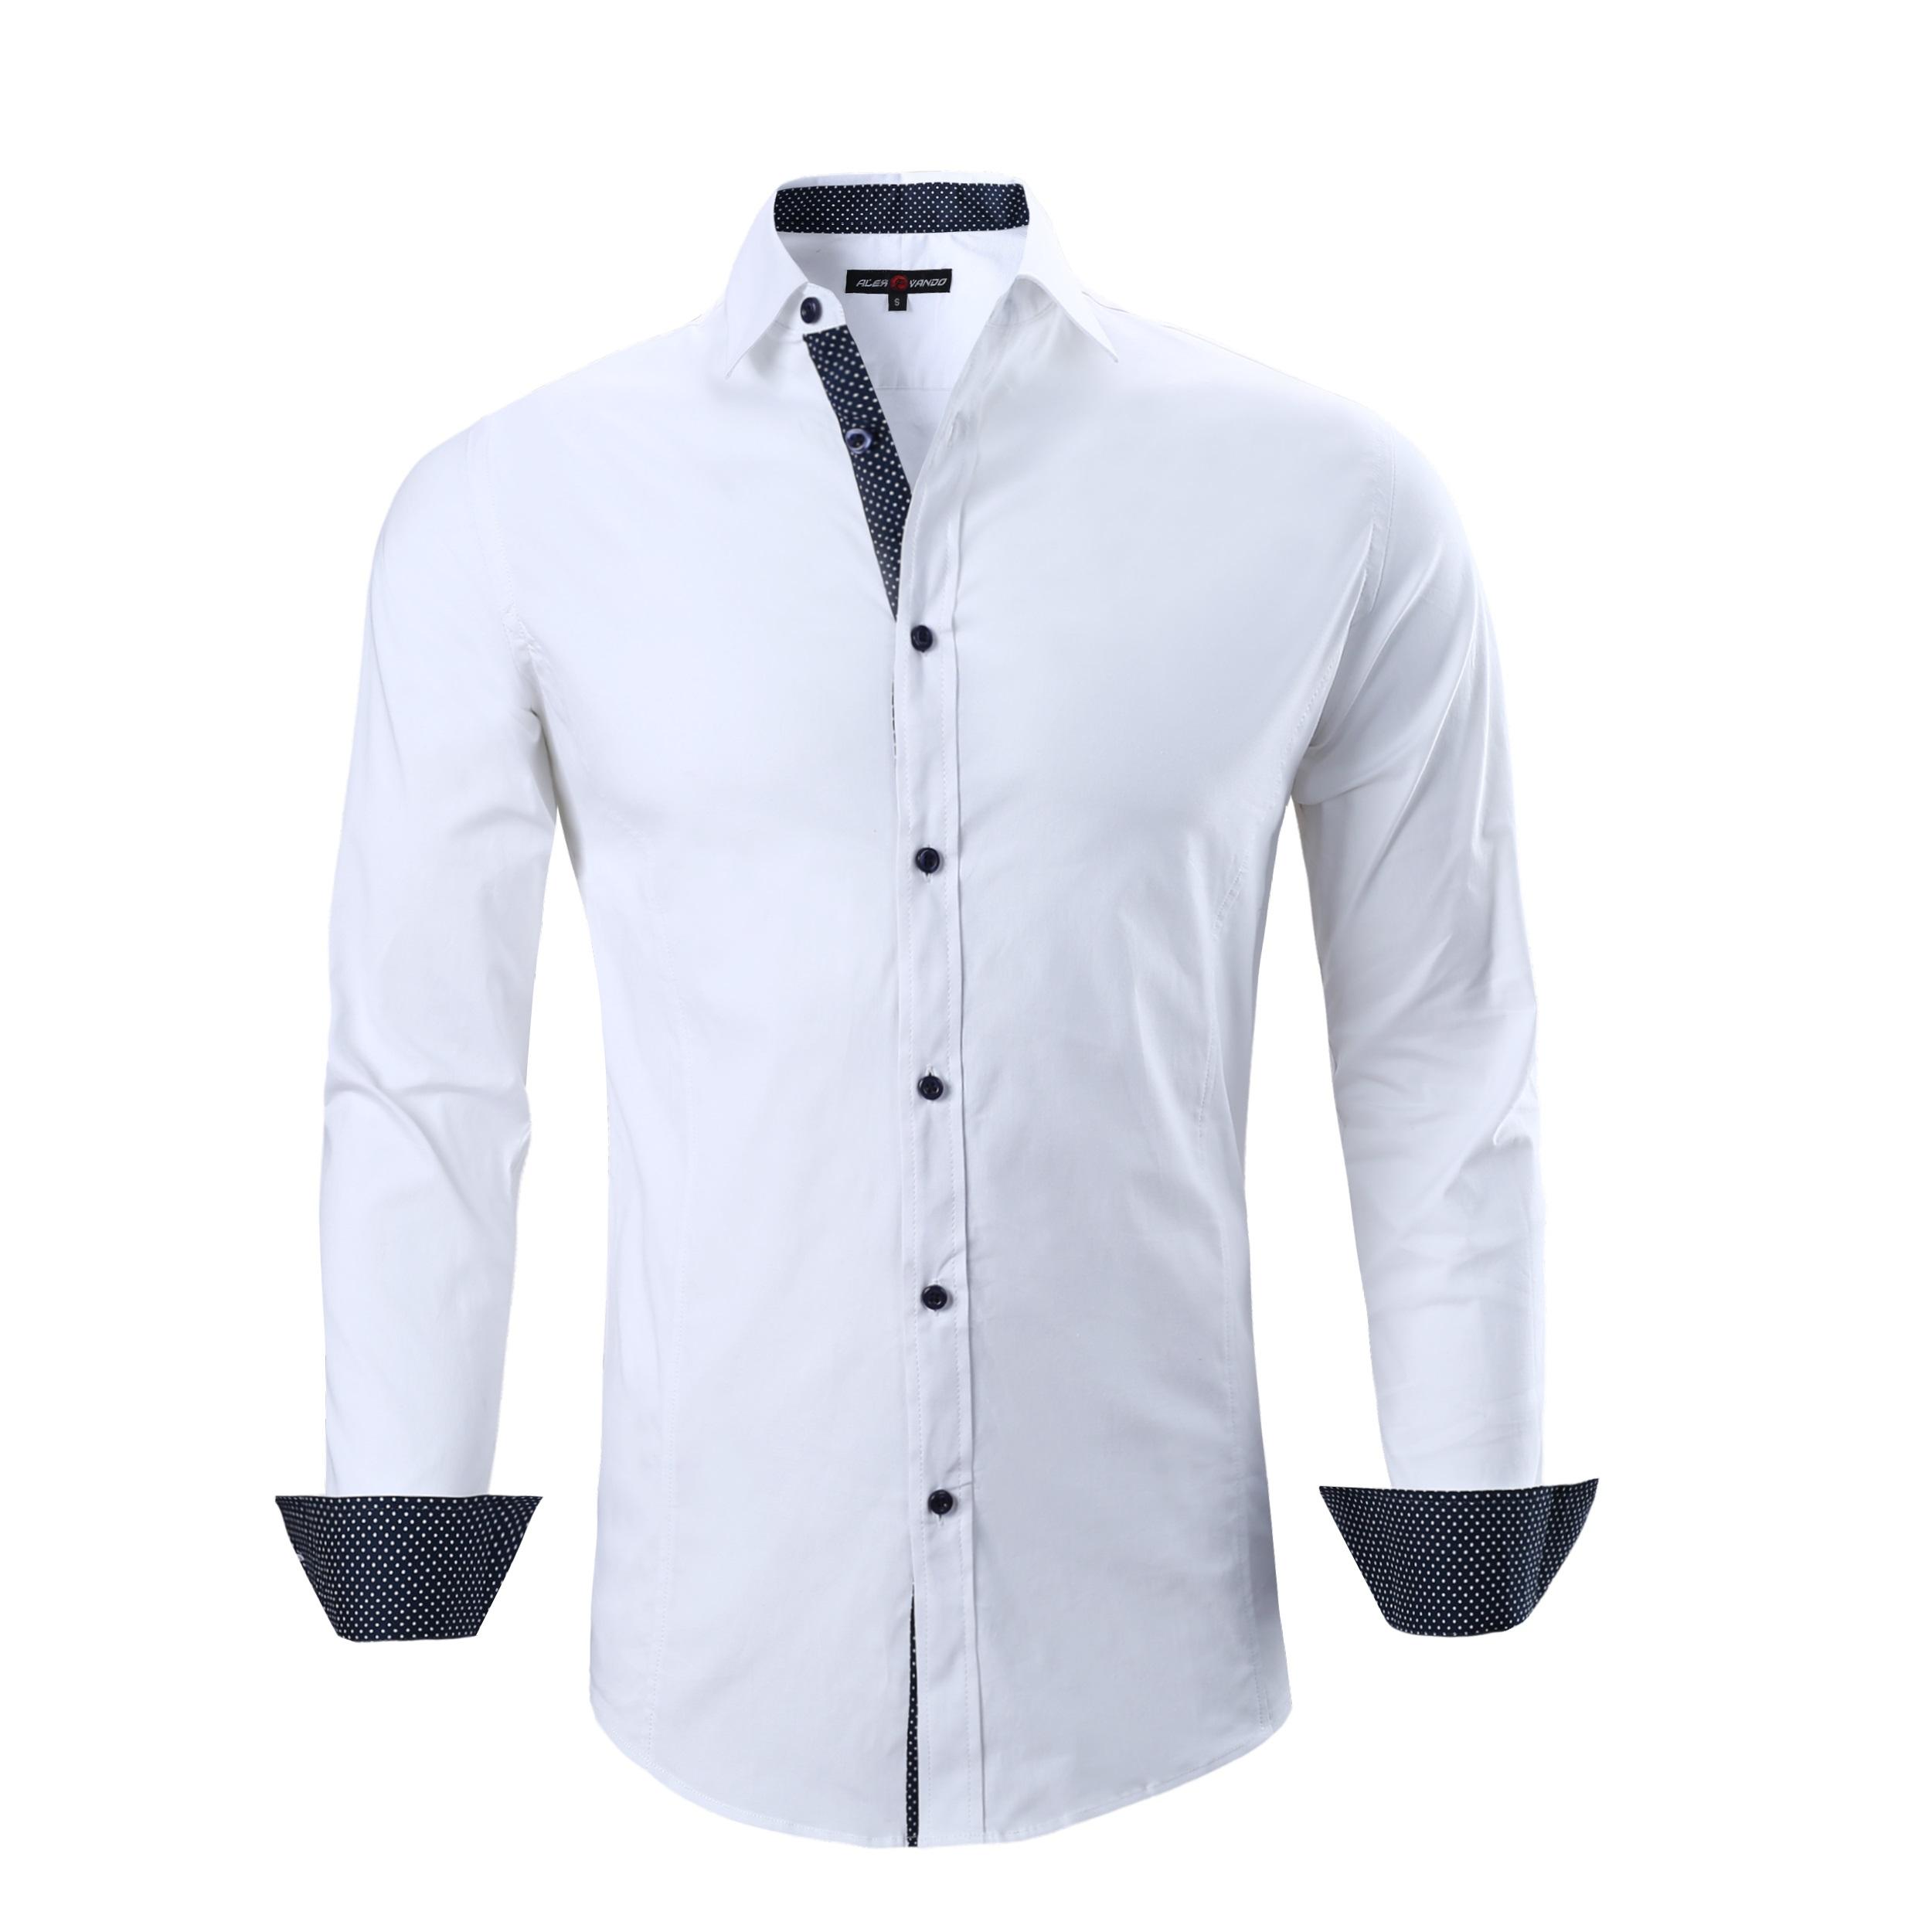 Mens Dress Shirts Cotton Spandex Casual Regular Fit Long Sleeve Shirt White